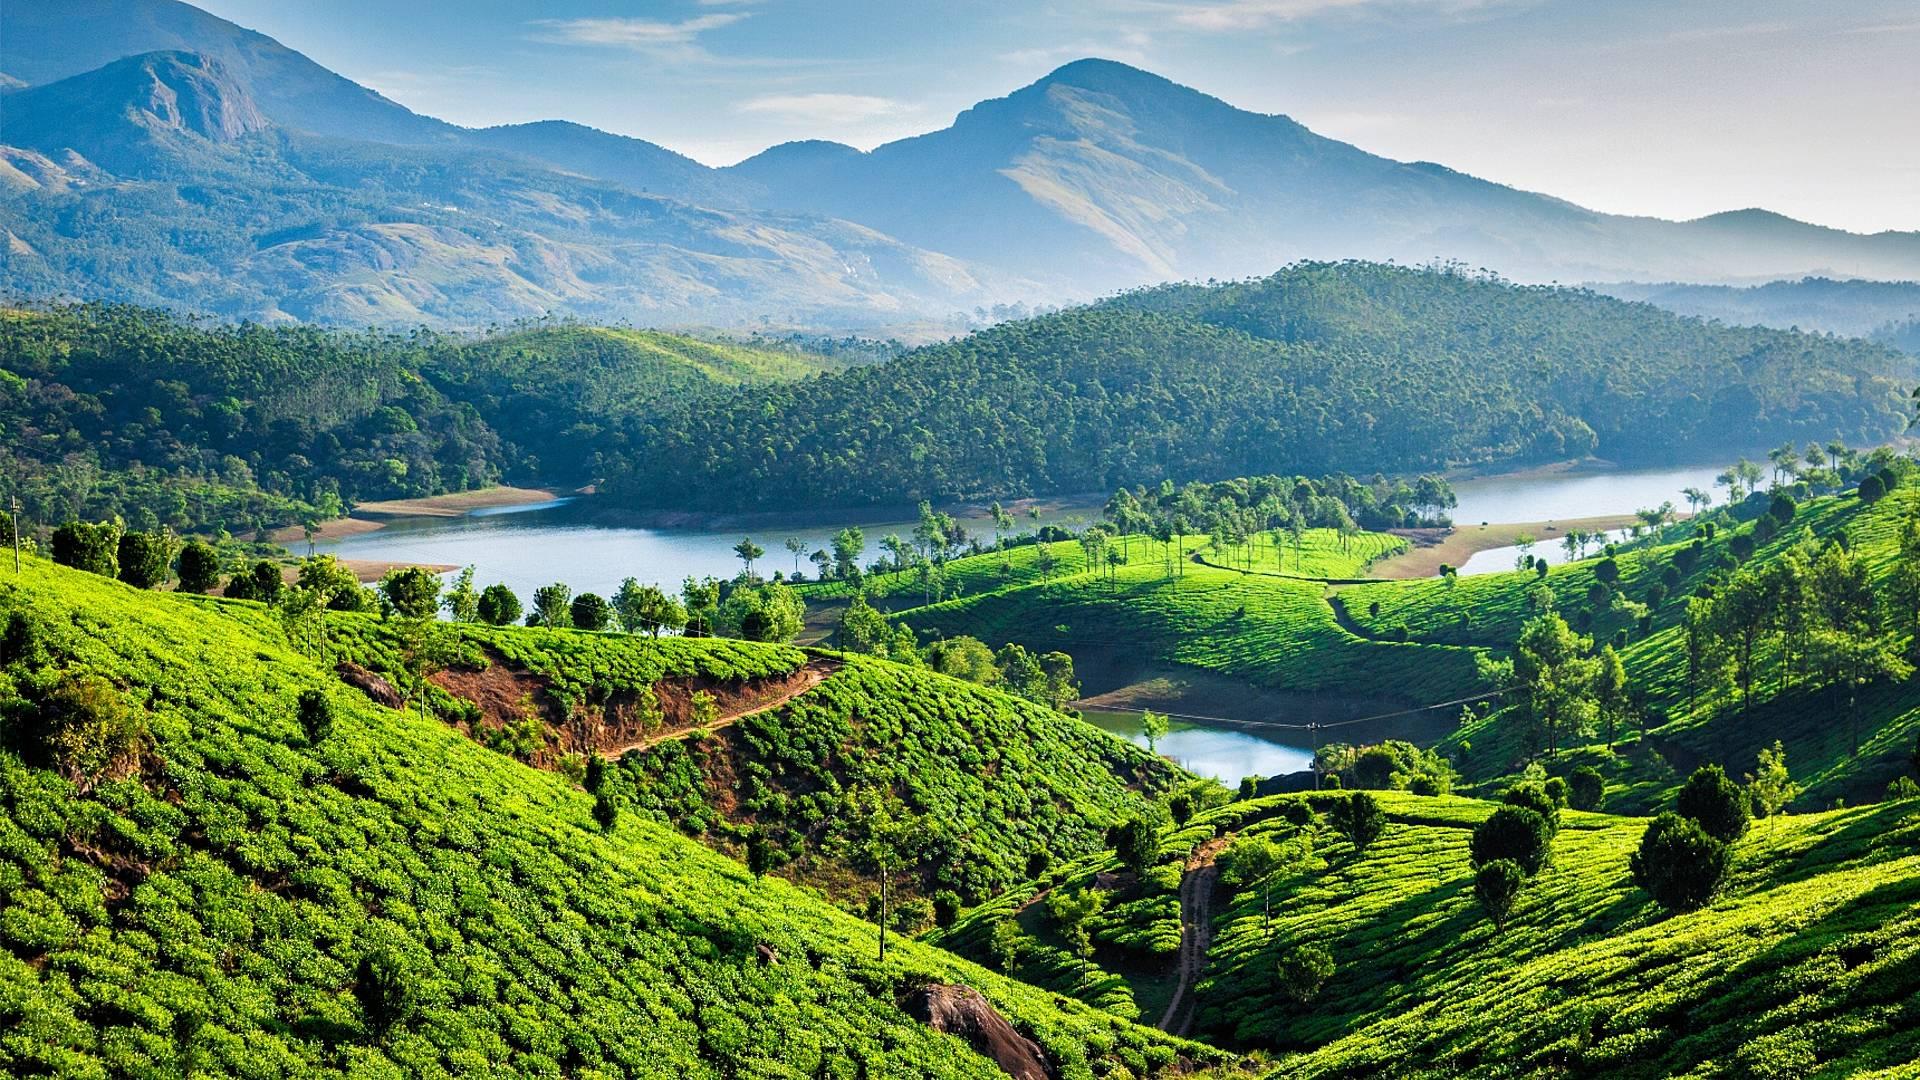 Hoch zu Rad durch Keralas verträumte Teelandschaften